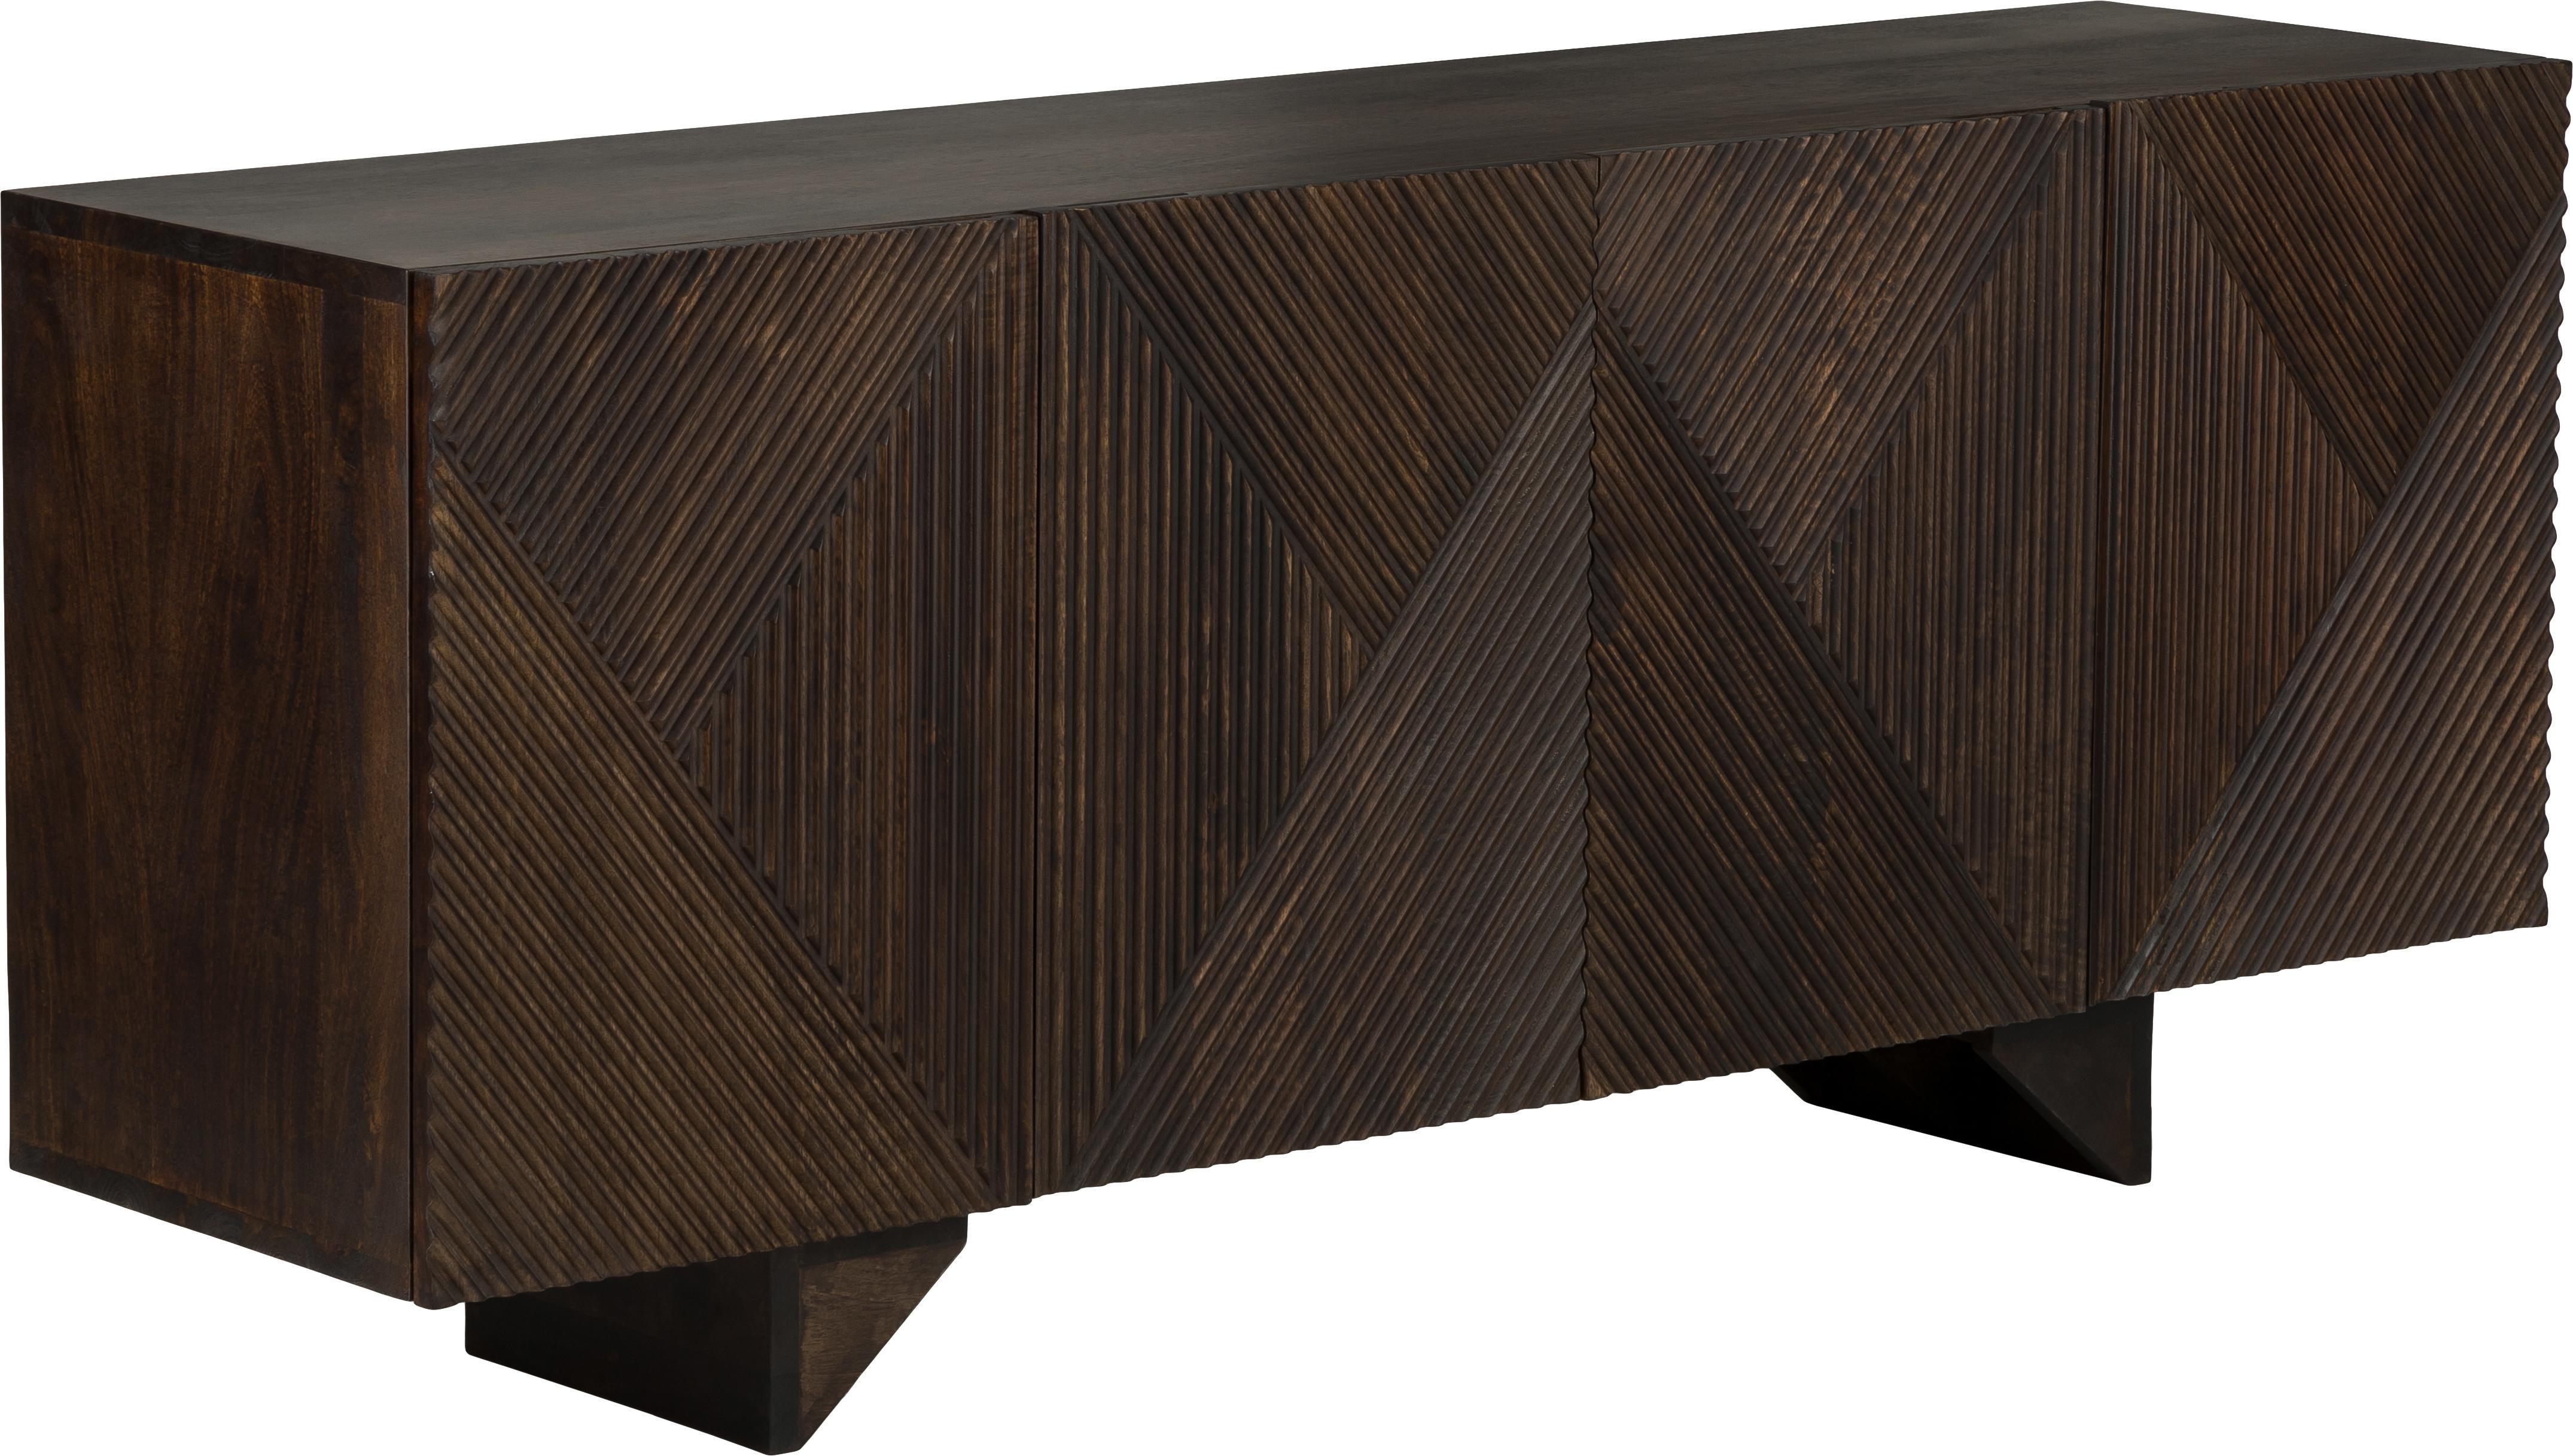 Sideboard Louis aus massivem Mangoholz, Massives Mangoholz, lackiert, Mangoholz, lackiert, 177 x 75 cm